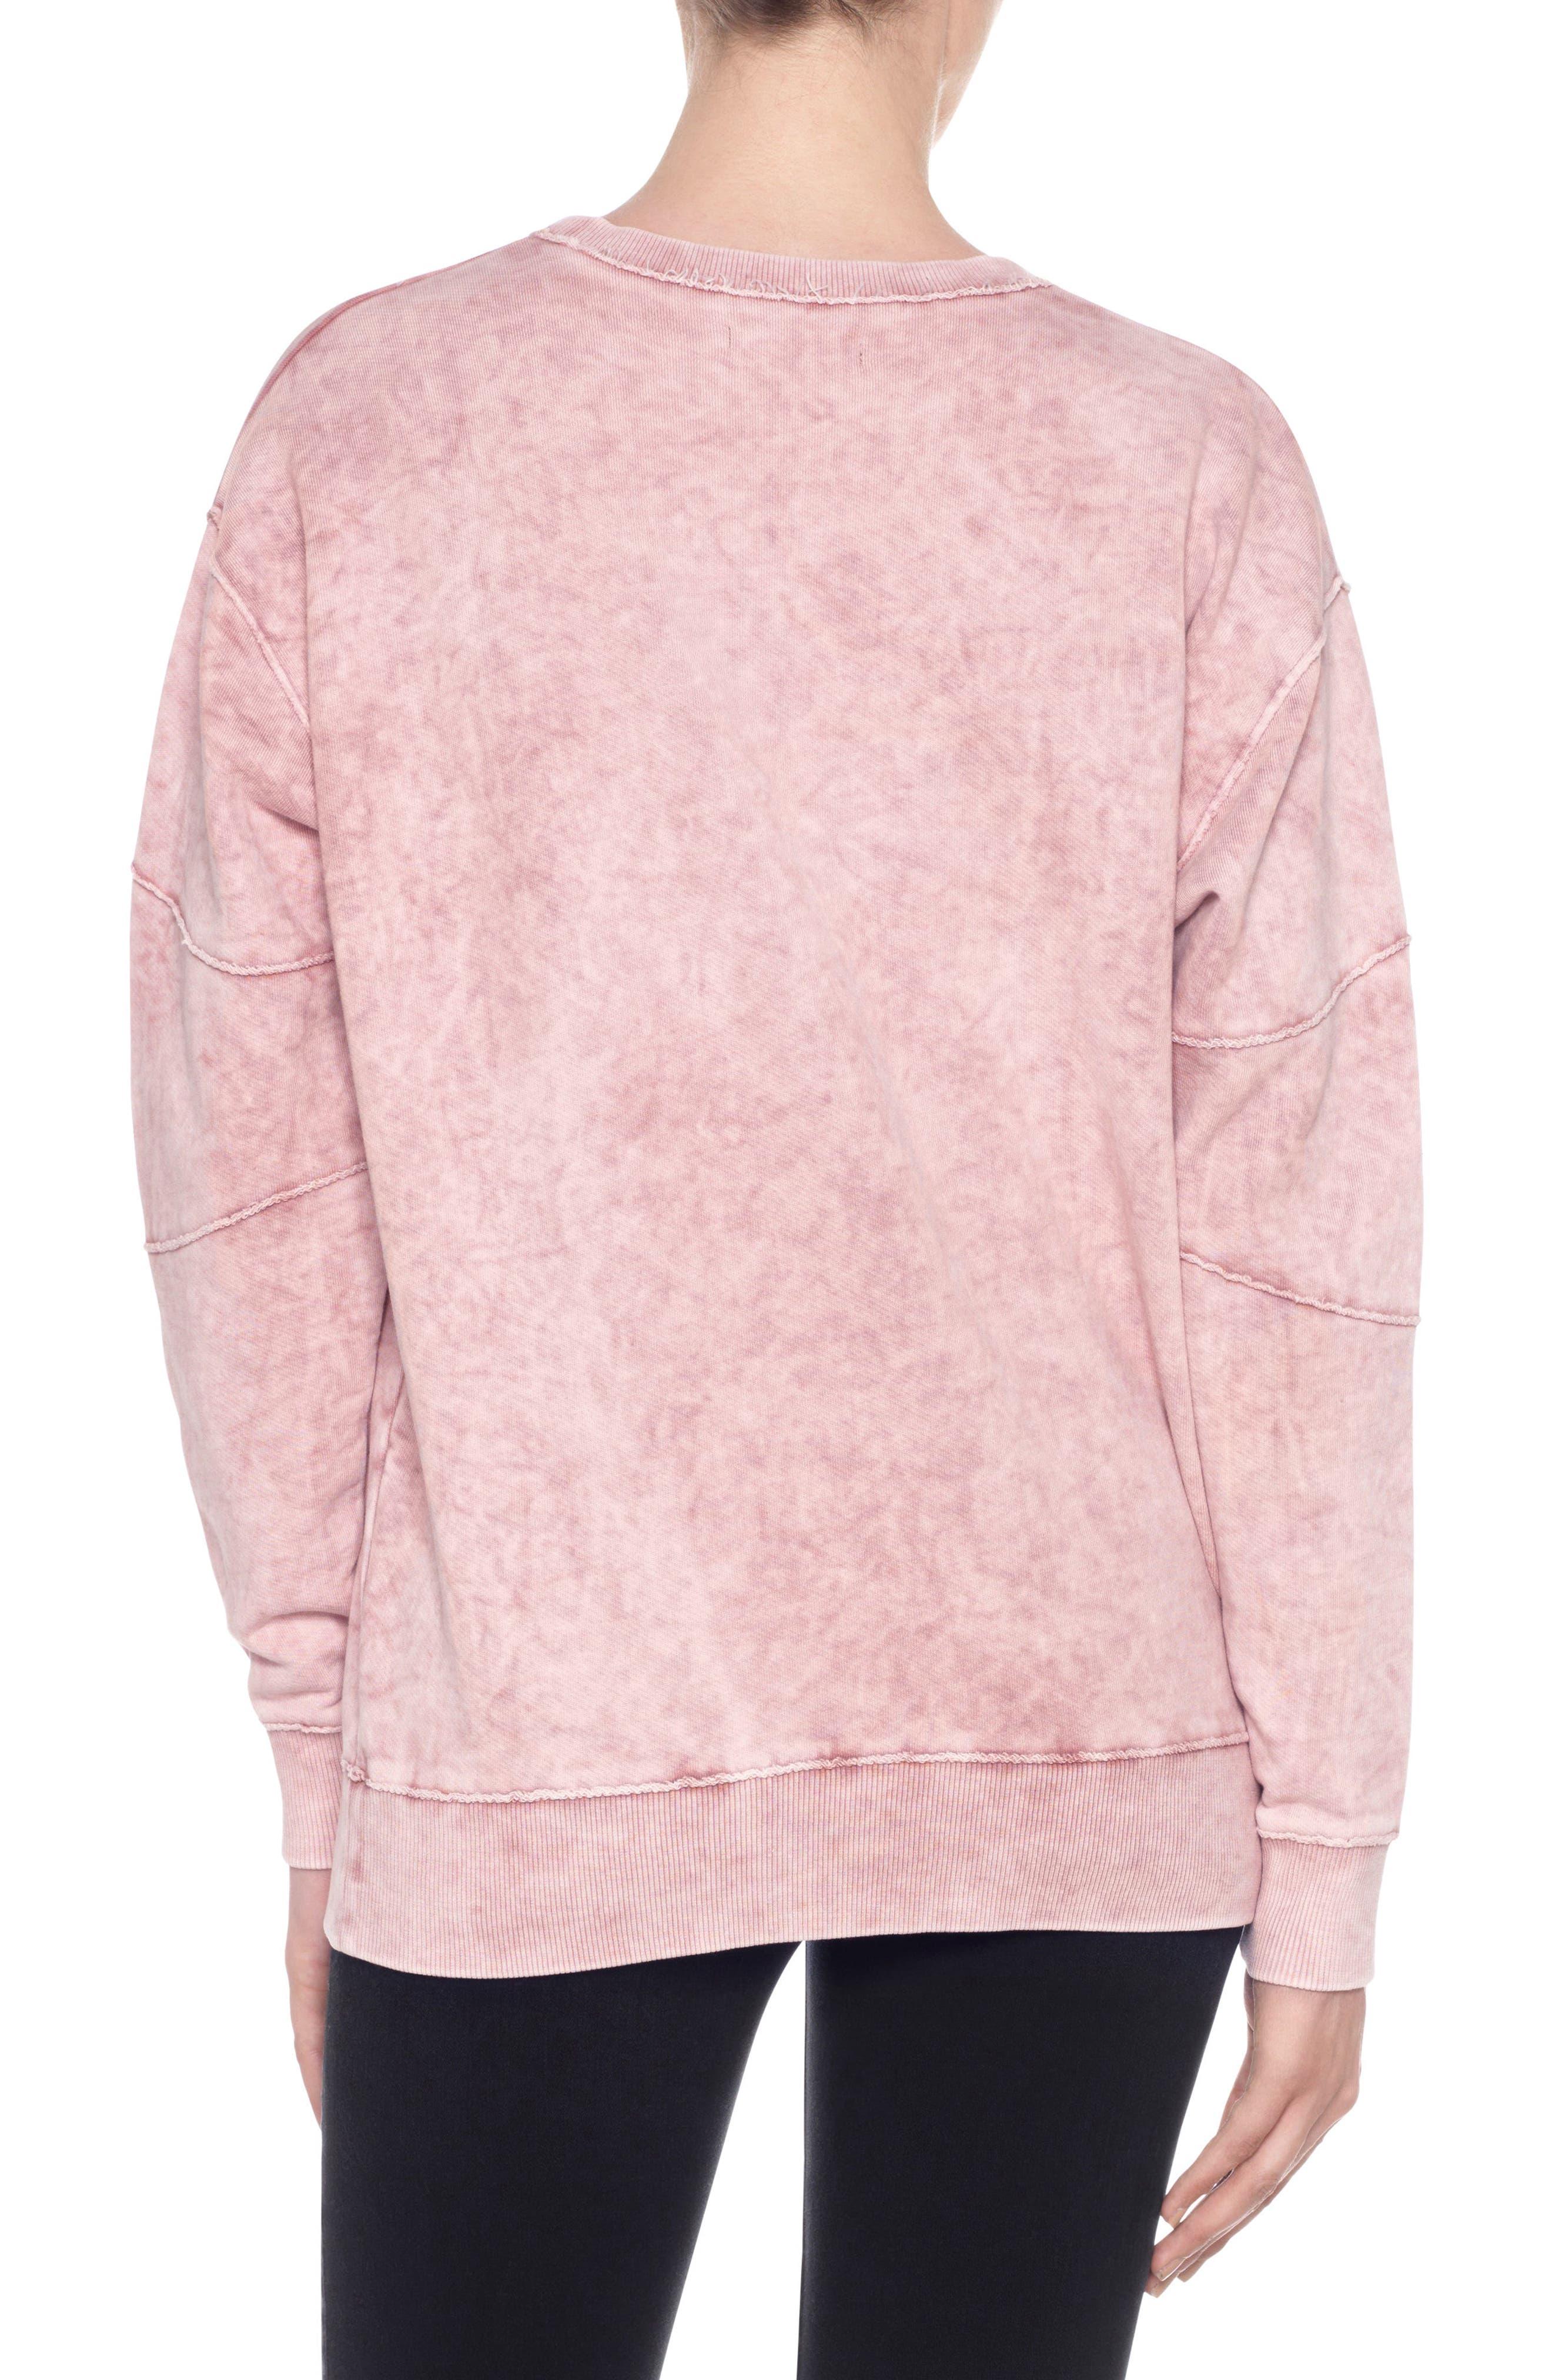 Kendall Sweatshirt,                             Alternate thumbnail 2, color,                             065